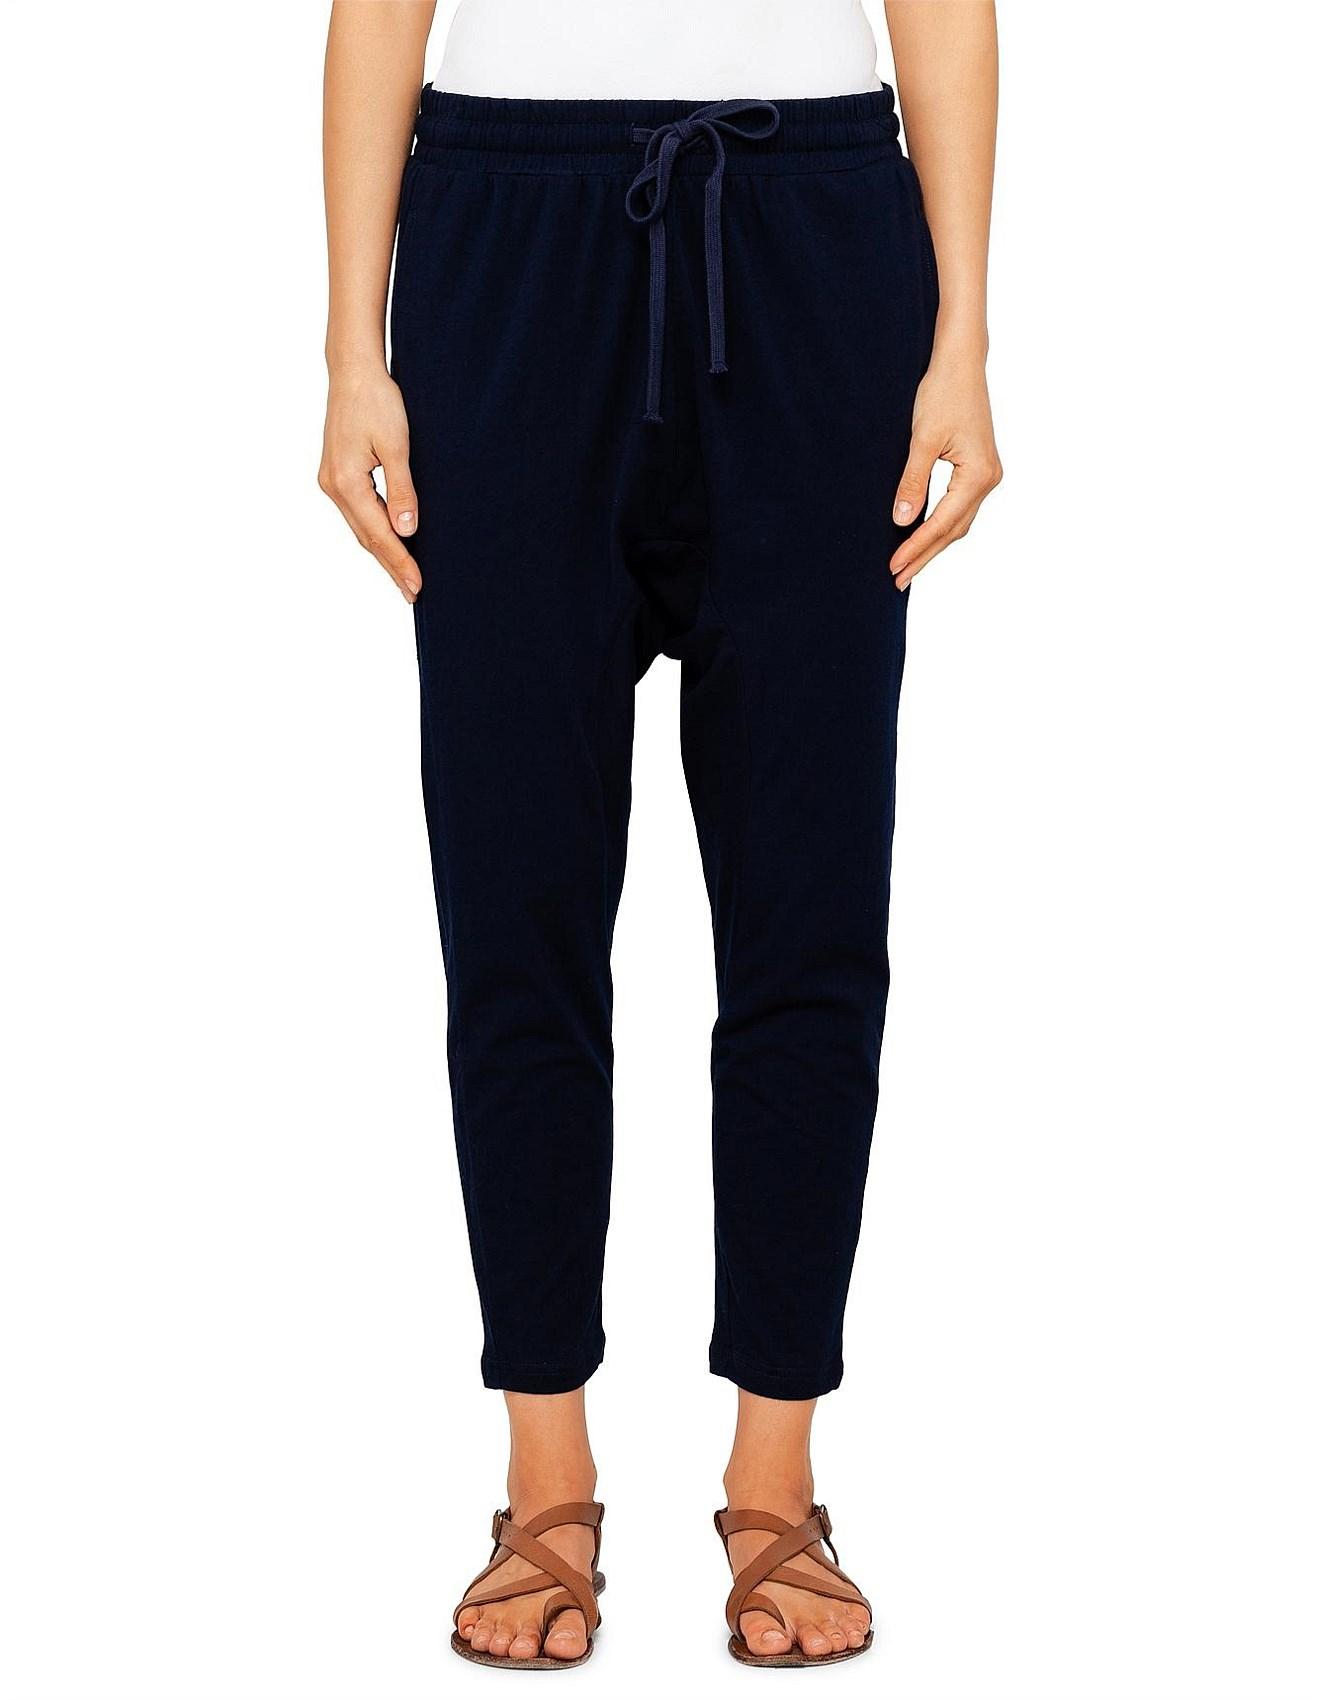 22a2477dc1a Women's Pants | Trousers, Culottes & Leggings | David Jones - Willa Jersey  Pant